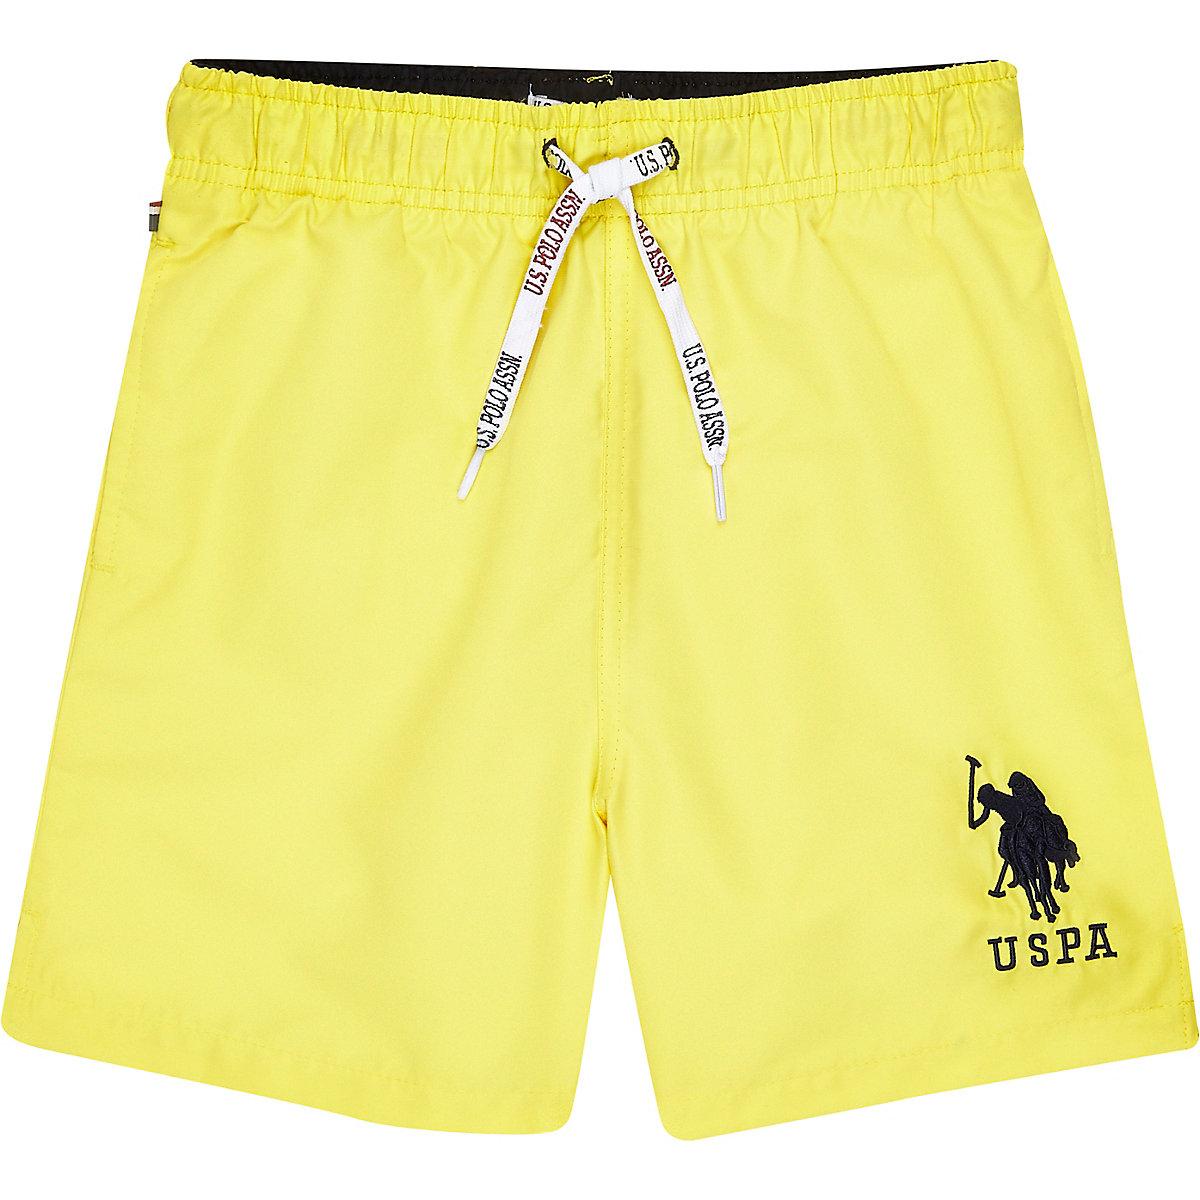 Boys yellow U.S. Polo Assn. swim shorts